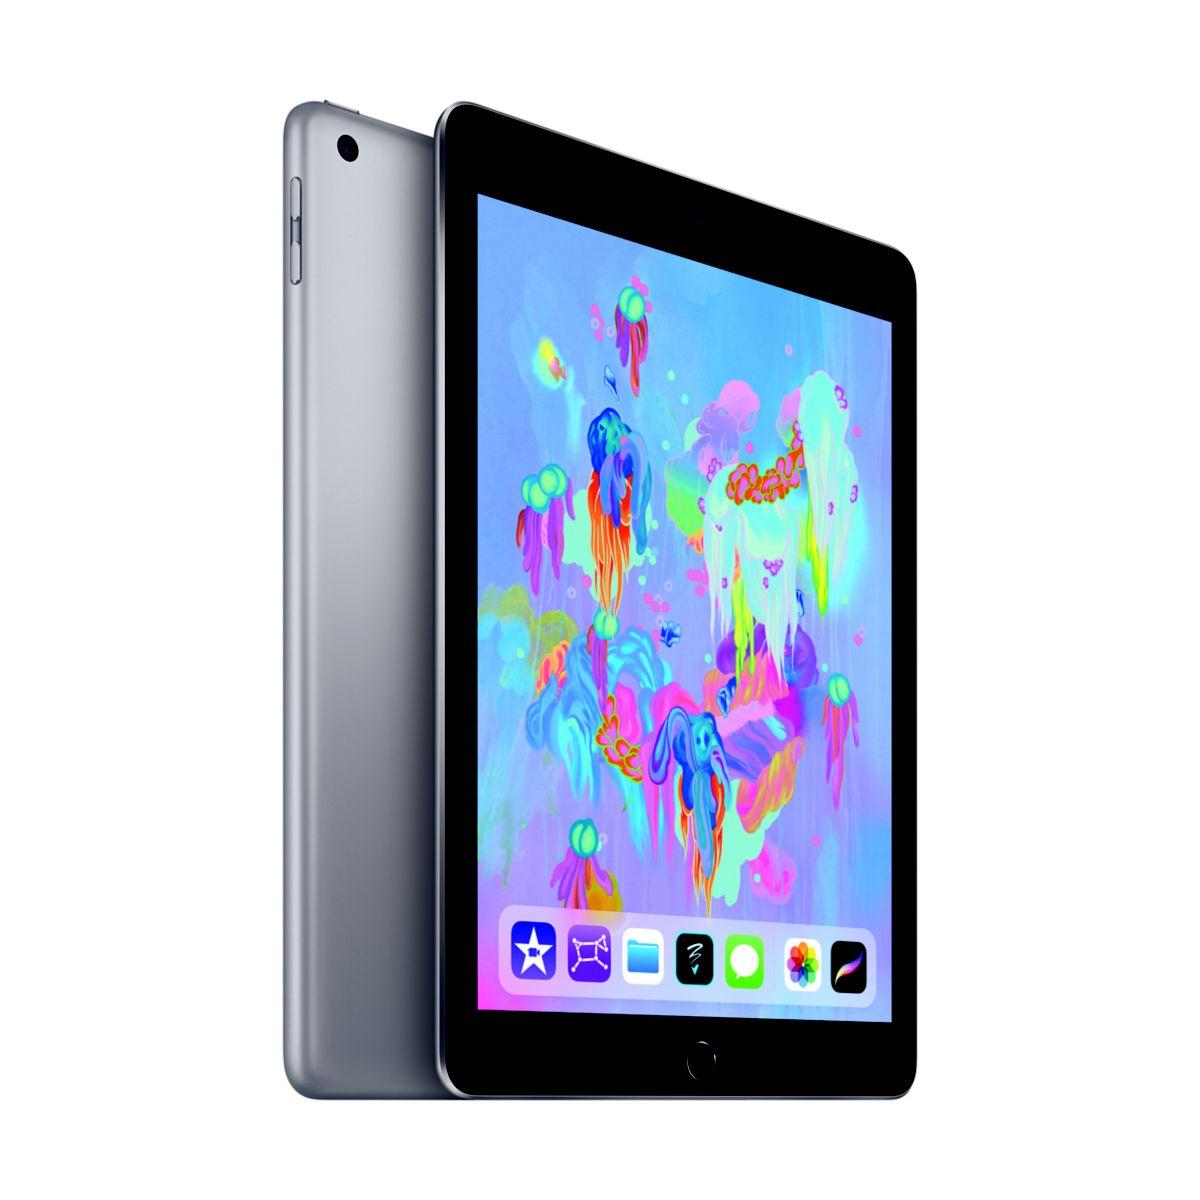 Tablette apple ipad new 128go cell gris sid (photo)